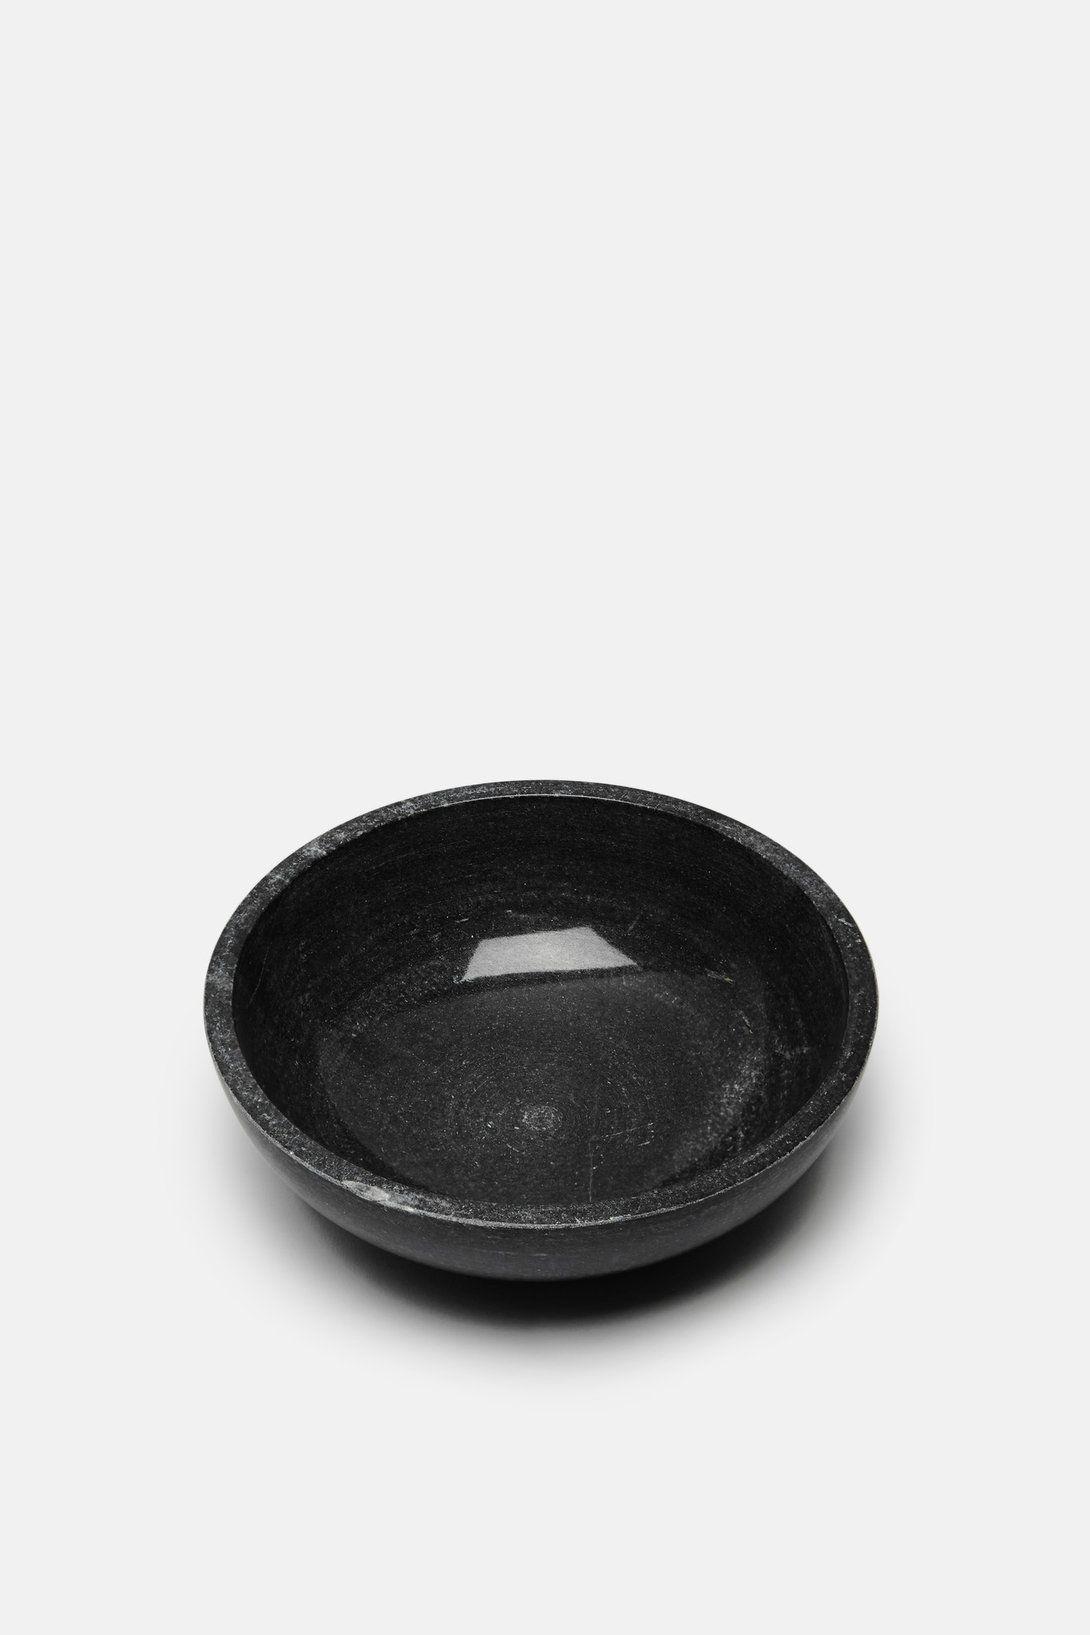 Small Marble Bowl Black Marble Bowl Elegant Bowl Bowl